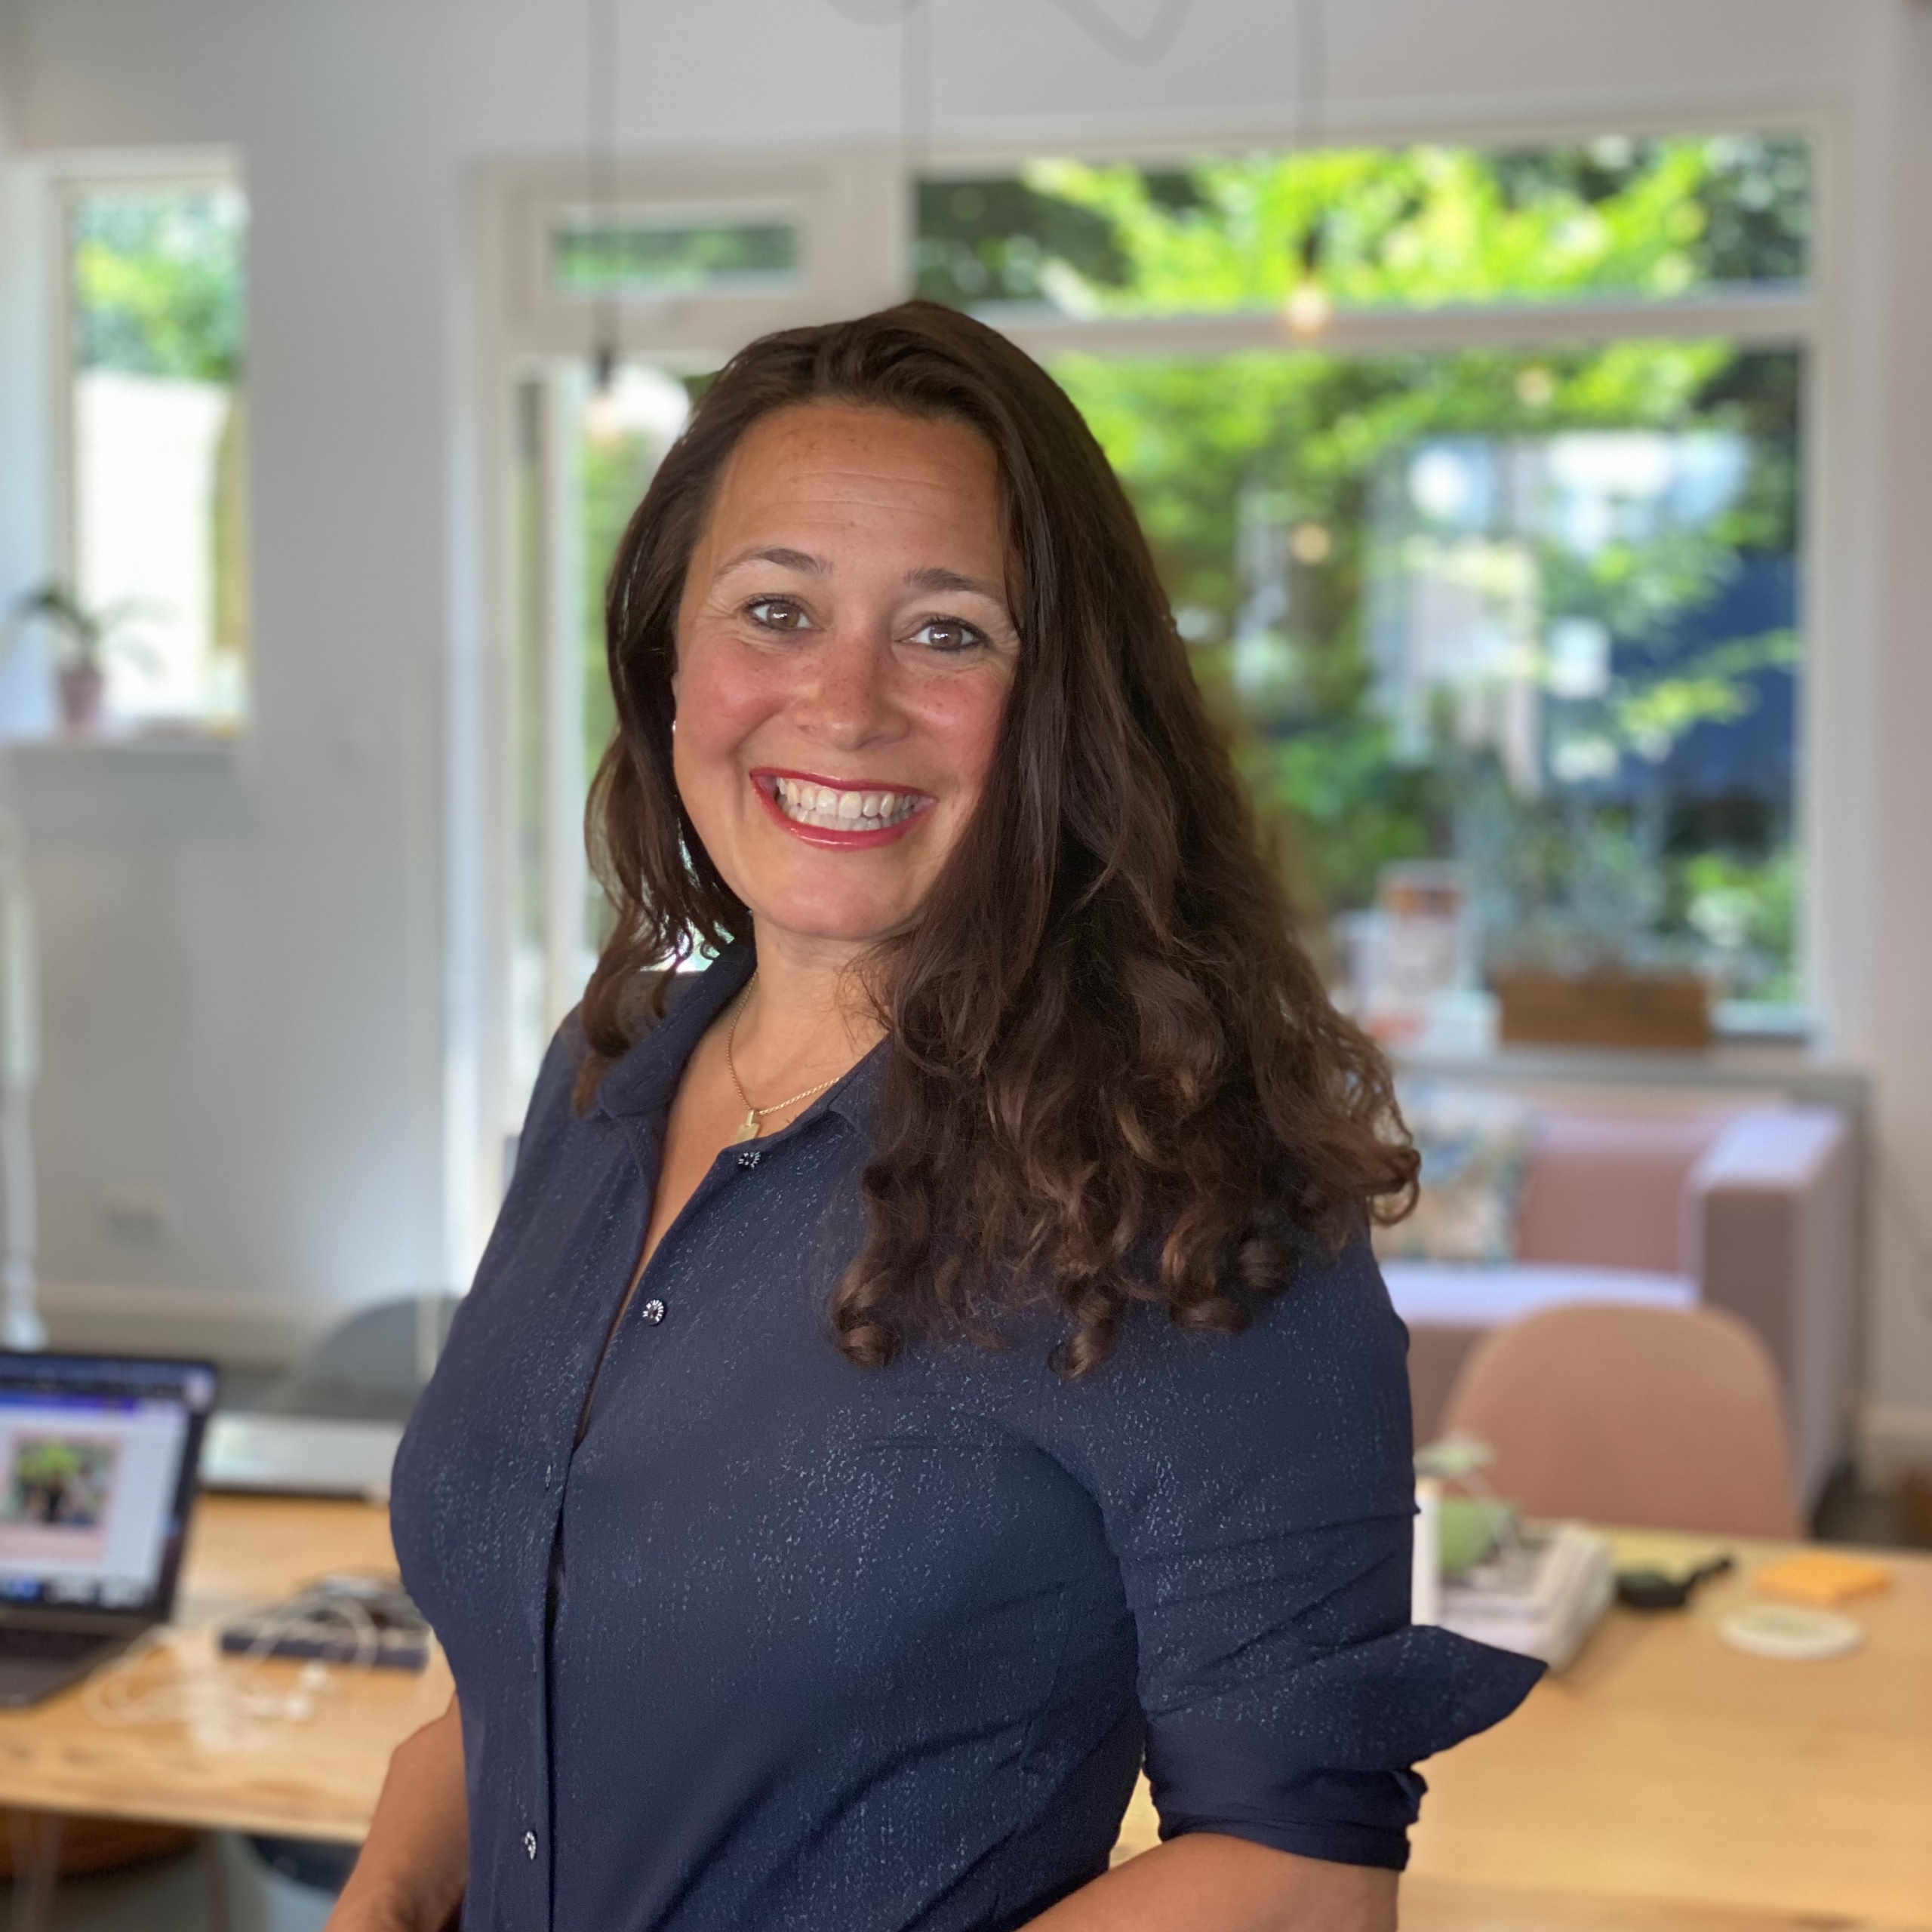 Suzanne Mau-Asam